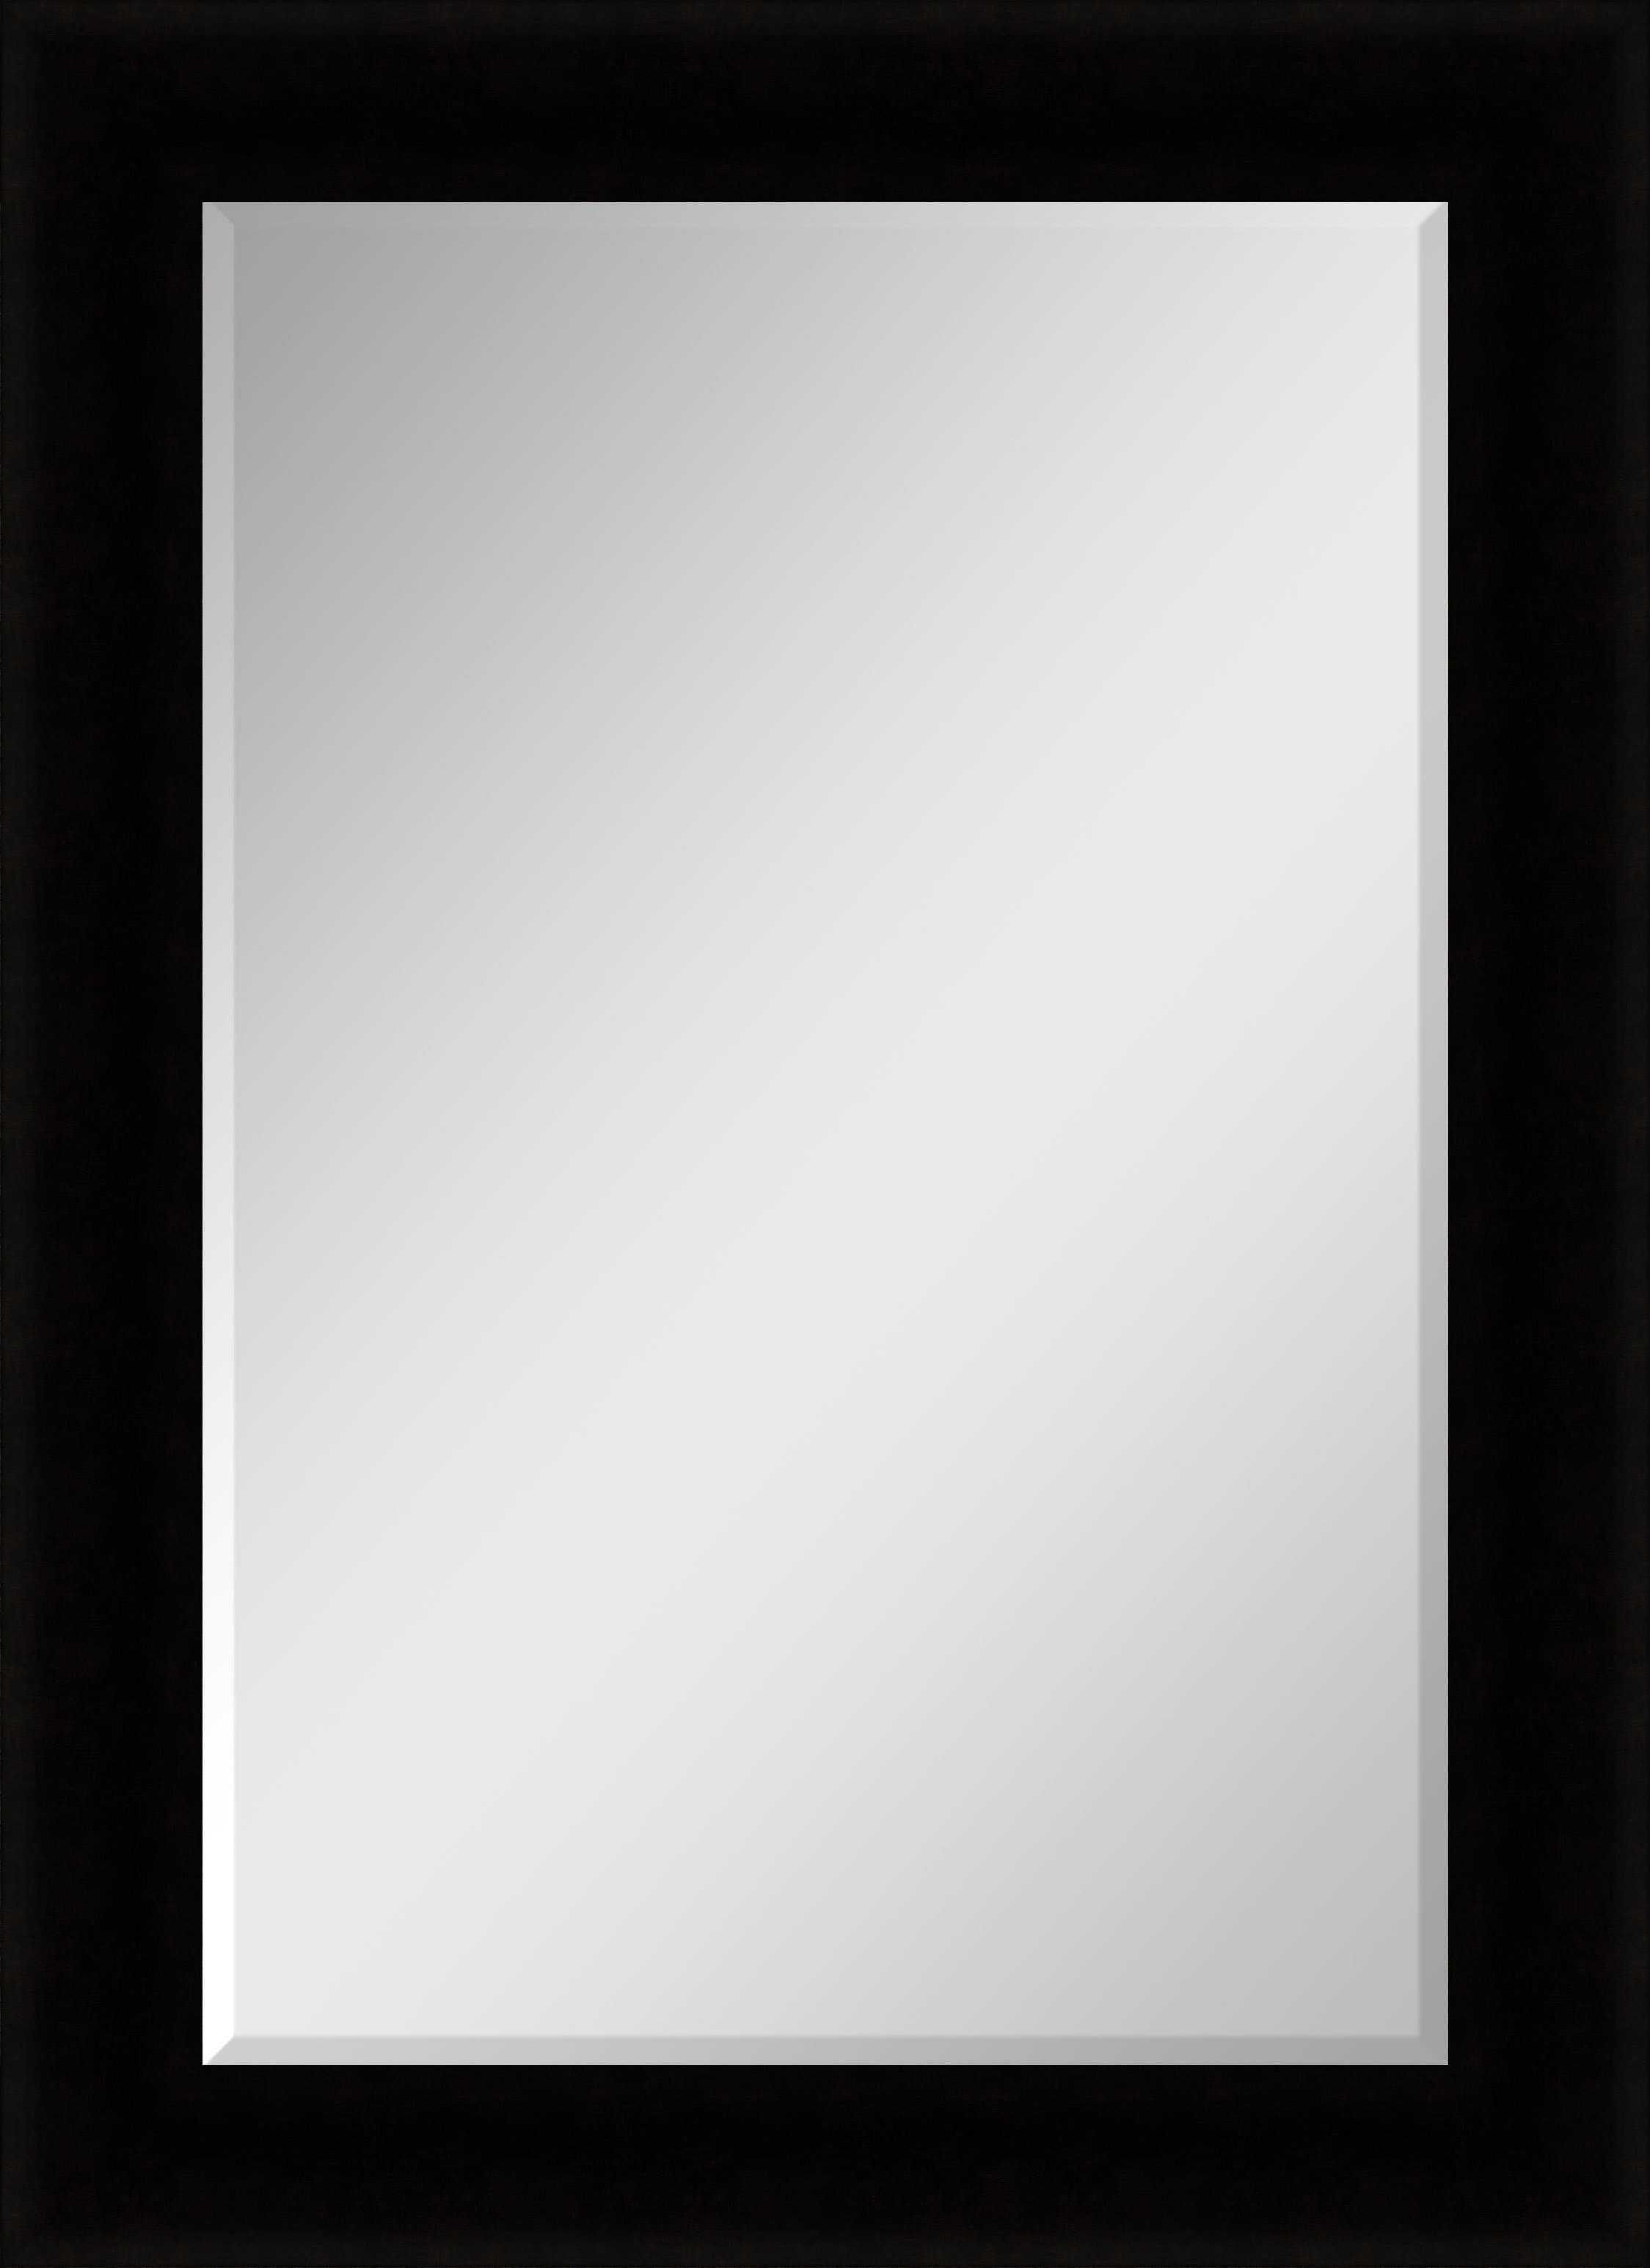 eco friendly plastic framed mirrorwall mirror buy wall mirrorphoto frame mirrordecorative framed mirror product on alibabacom